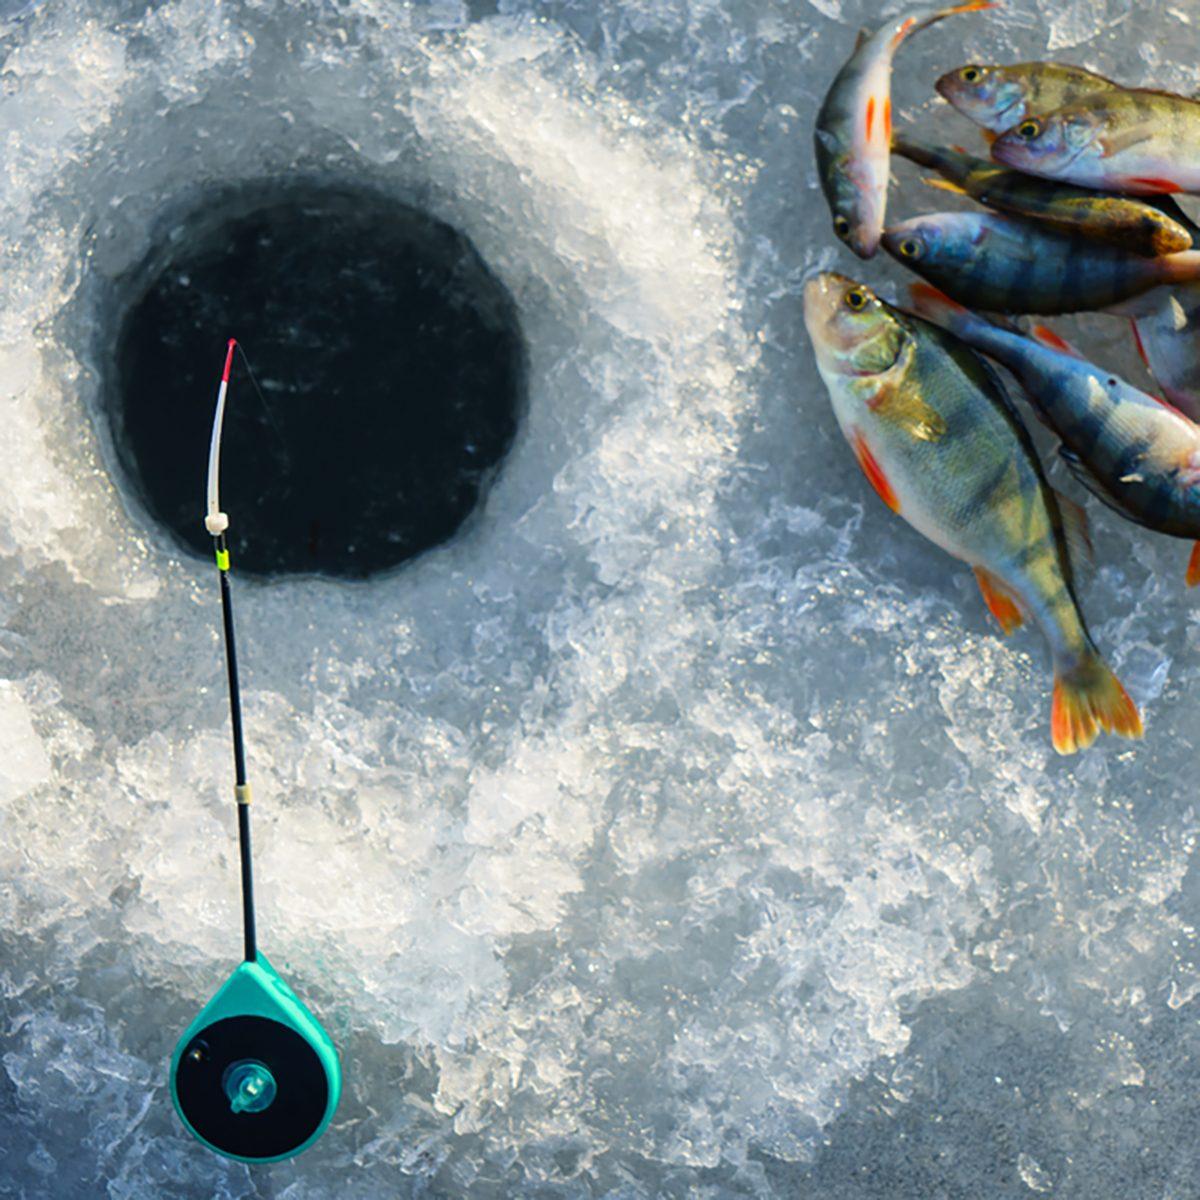 Ice fishing. Winter fishing